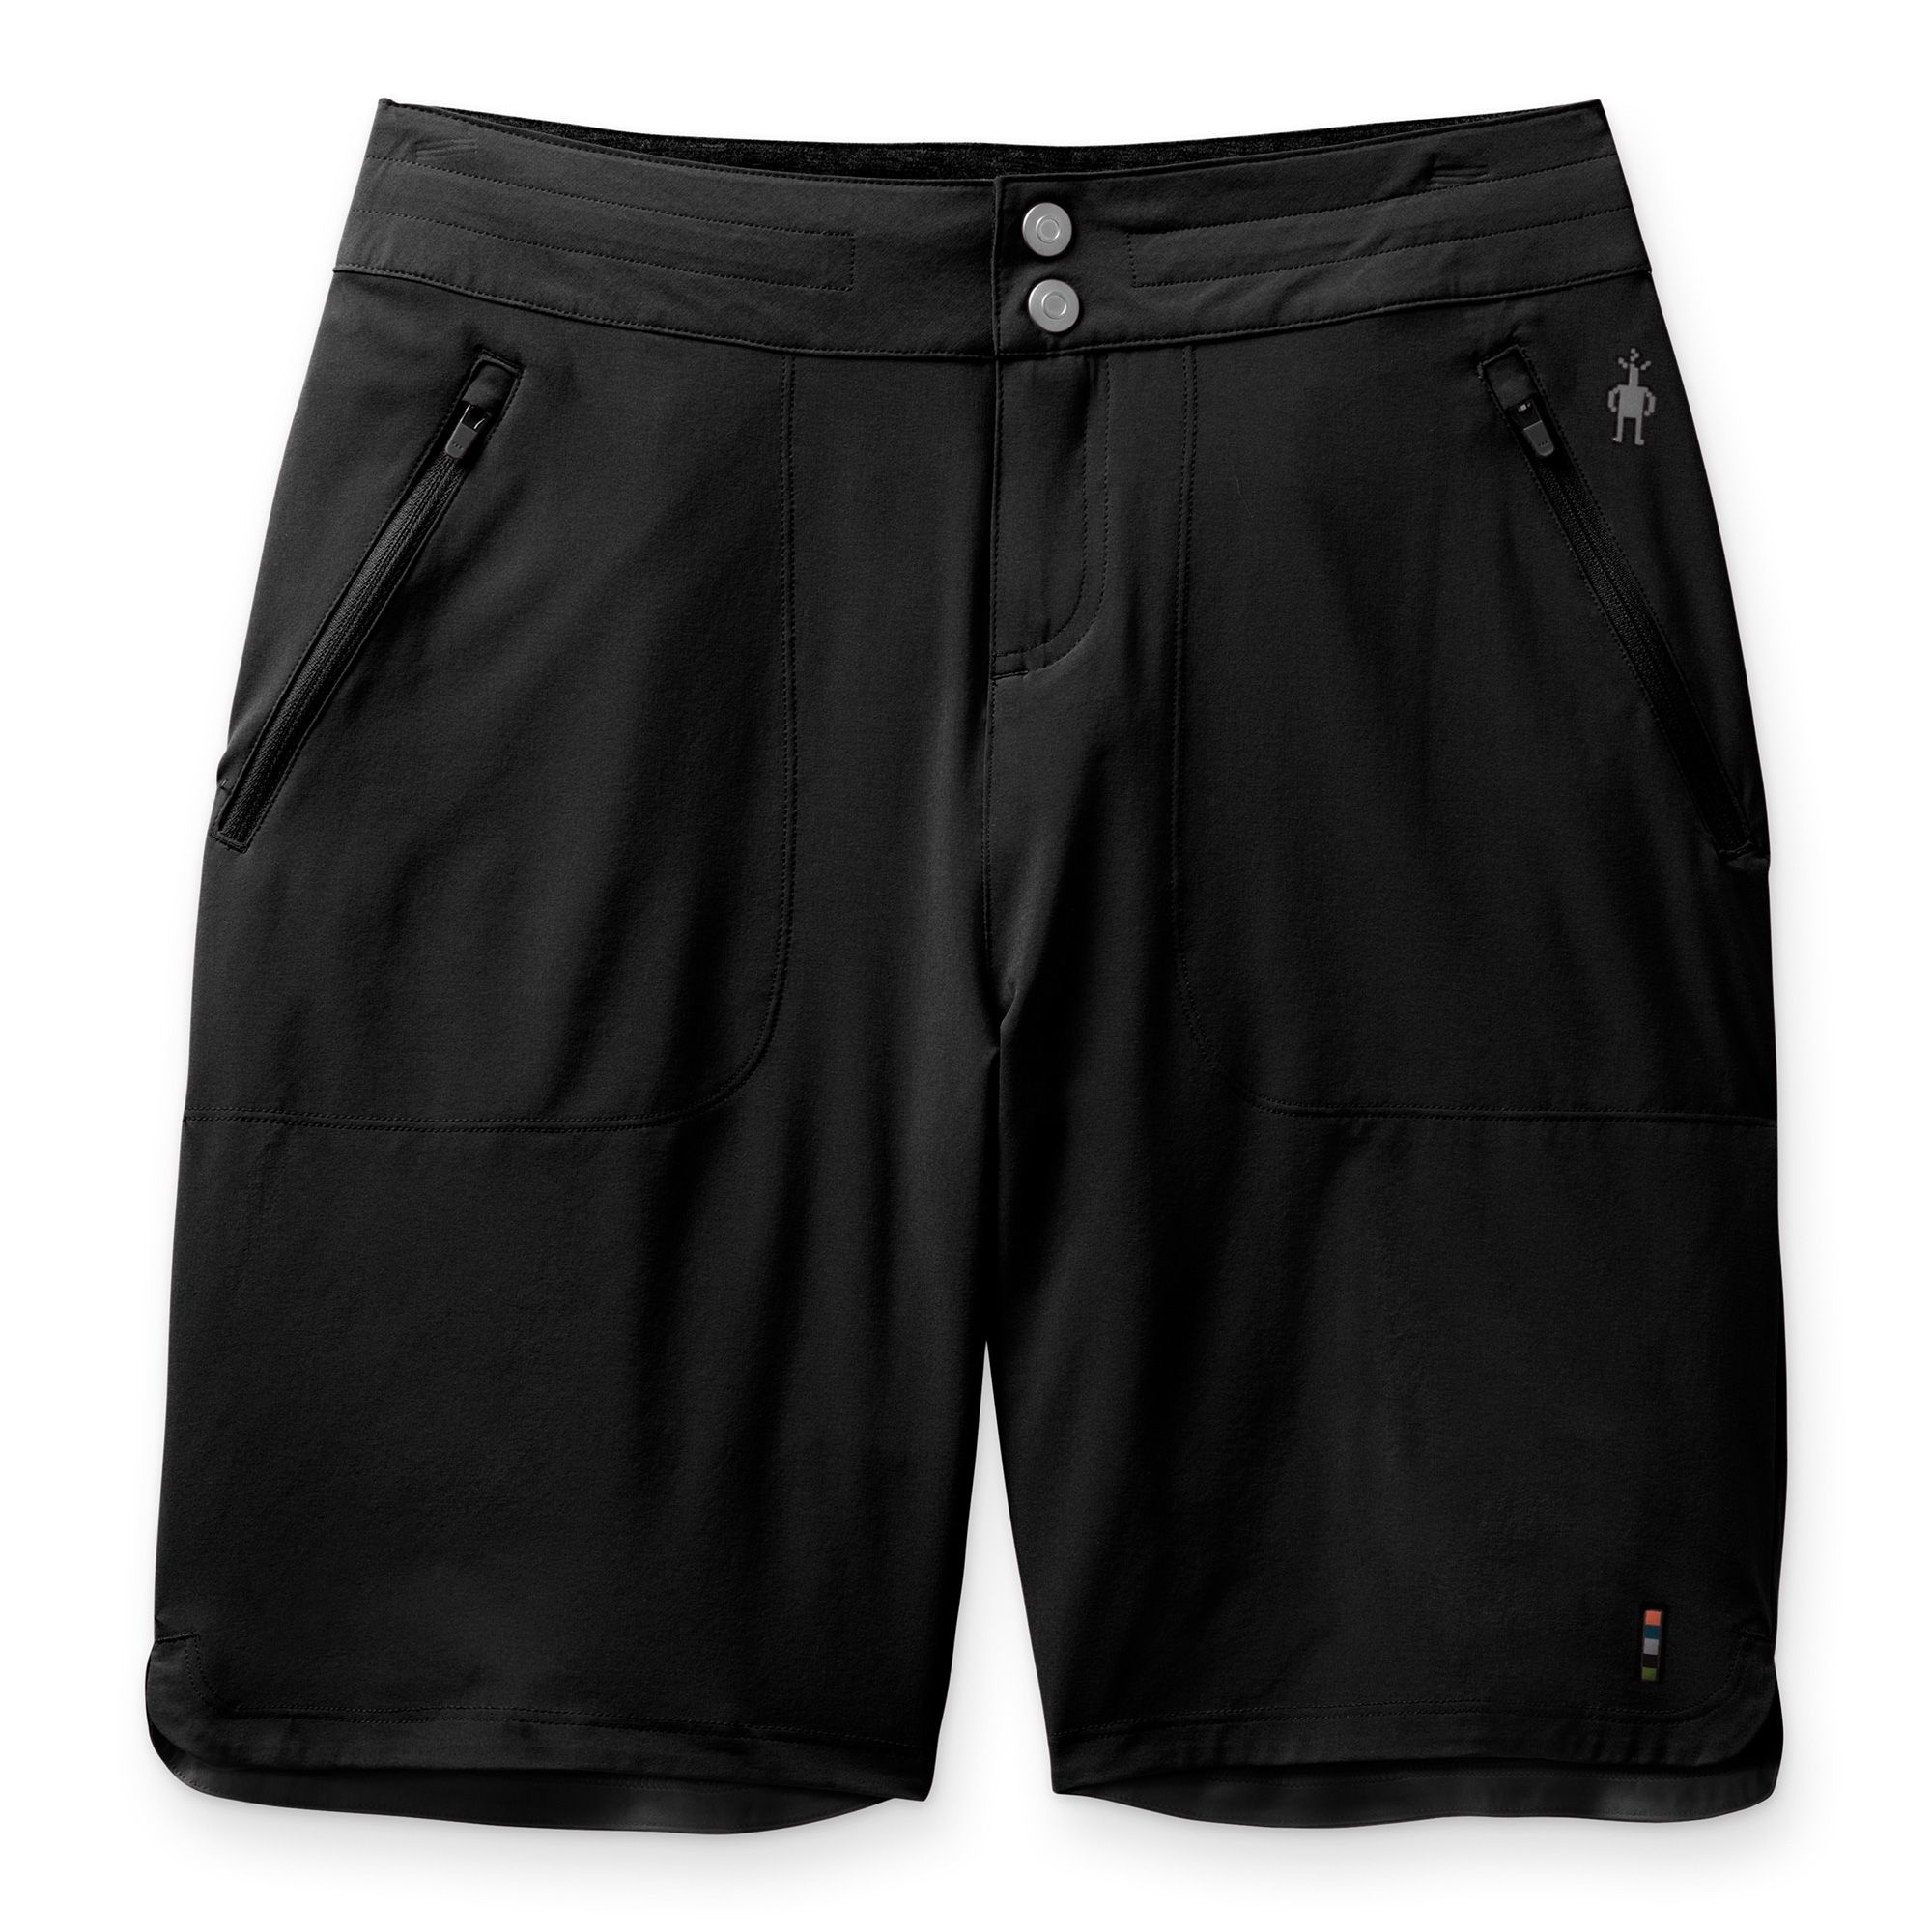 "W Merino Sport 9"" Short, Black"